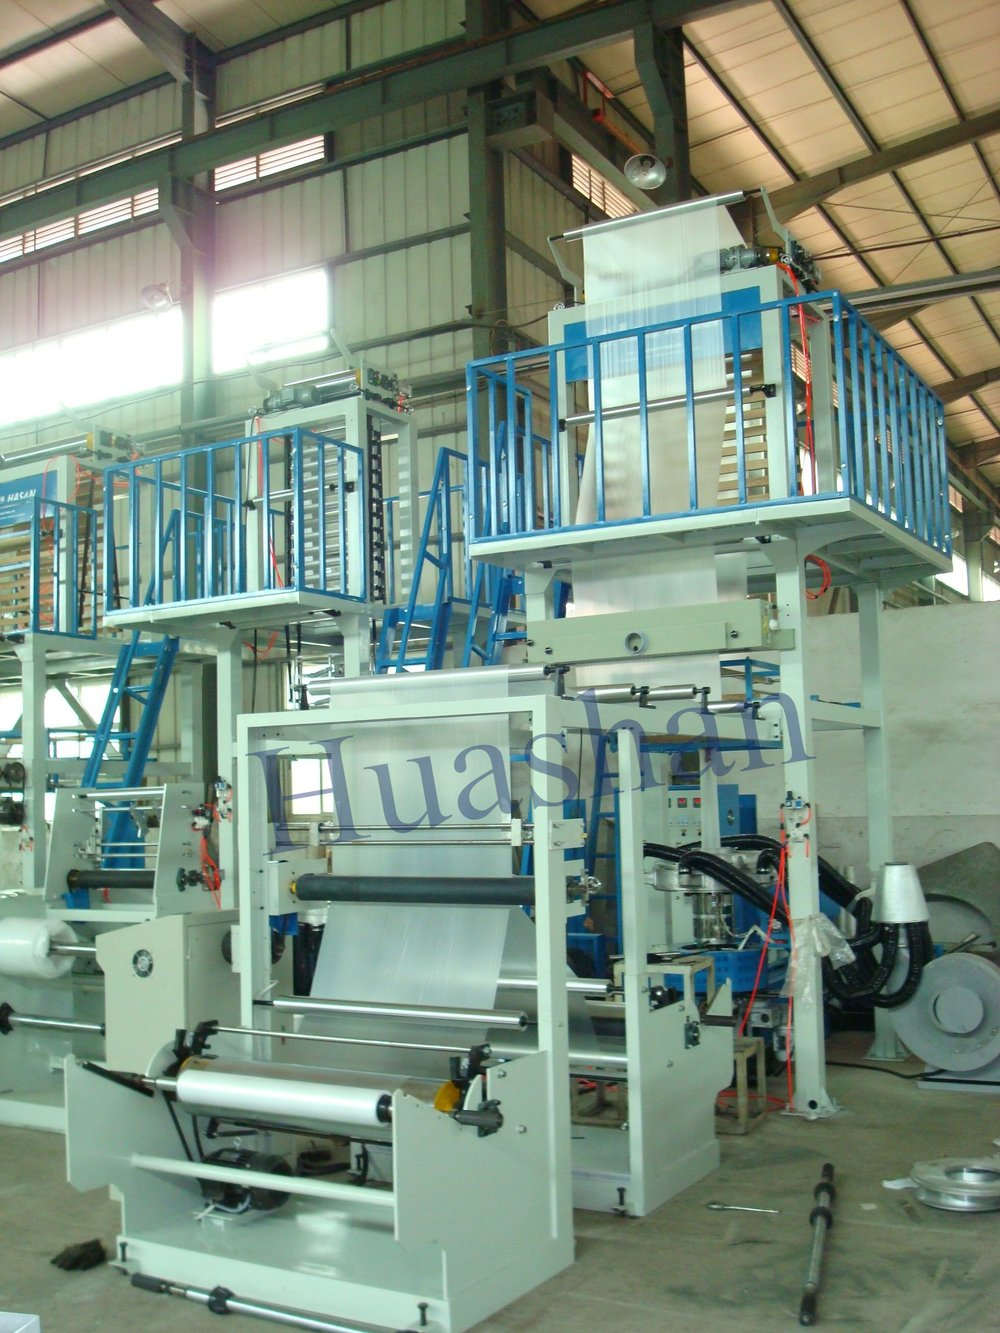 Good Quality plastic extrusion machine ,PE Plastic Film Blowing Machine (Rotary Die),PE Film Making machinery